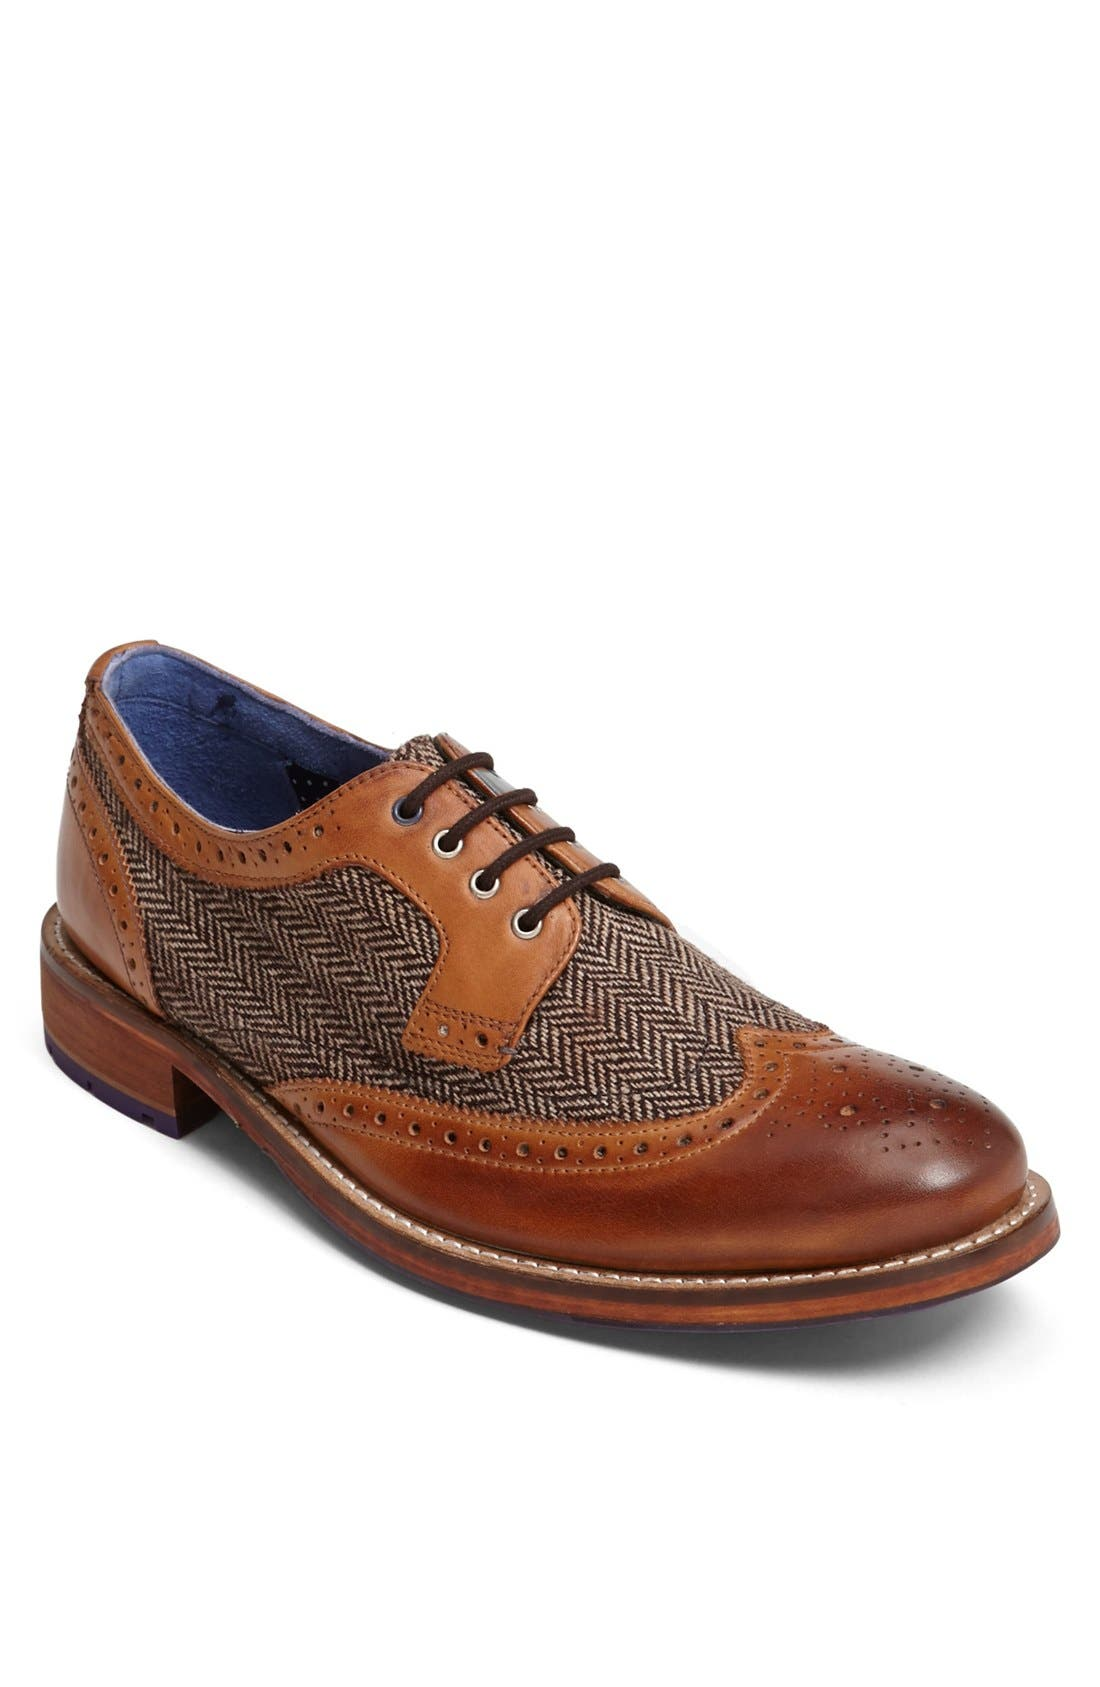 Alternate Image 1 Selected - Ted Baker London 'Cassiuss 2' Spectator Shoe